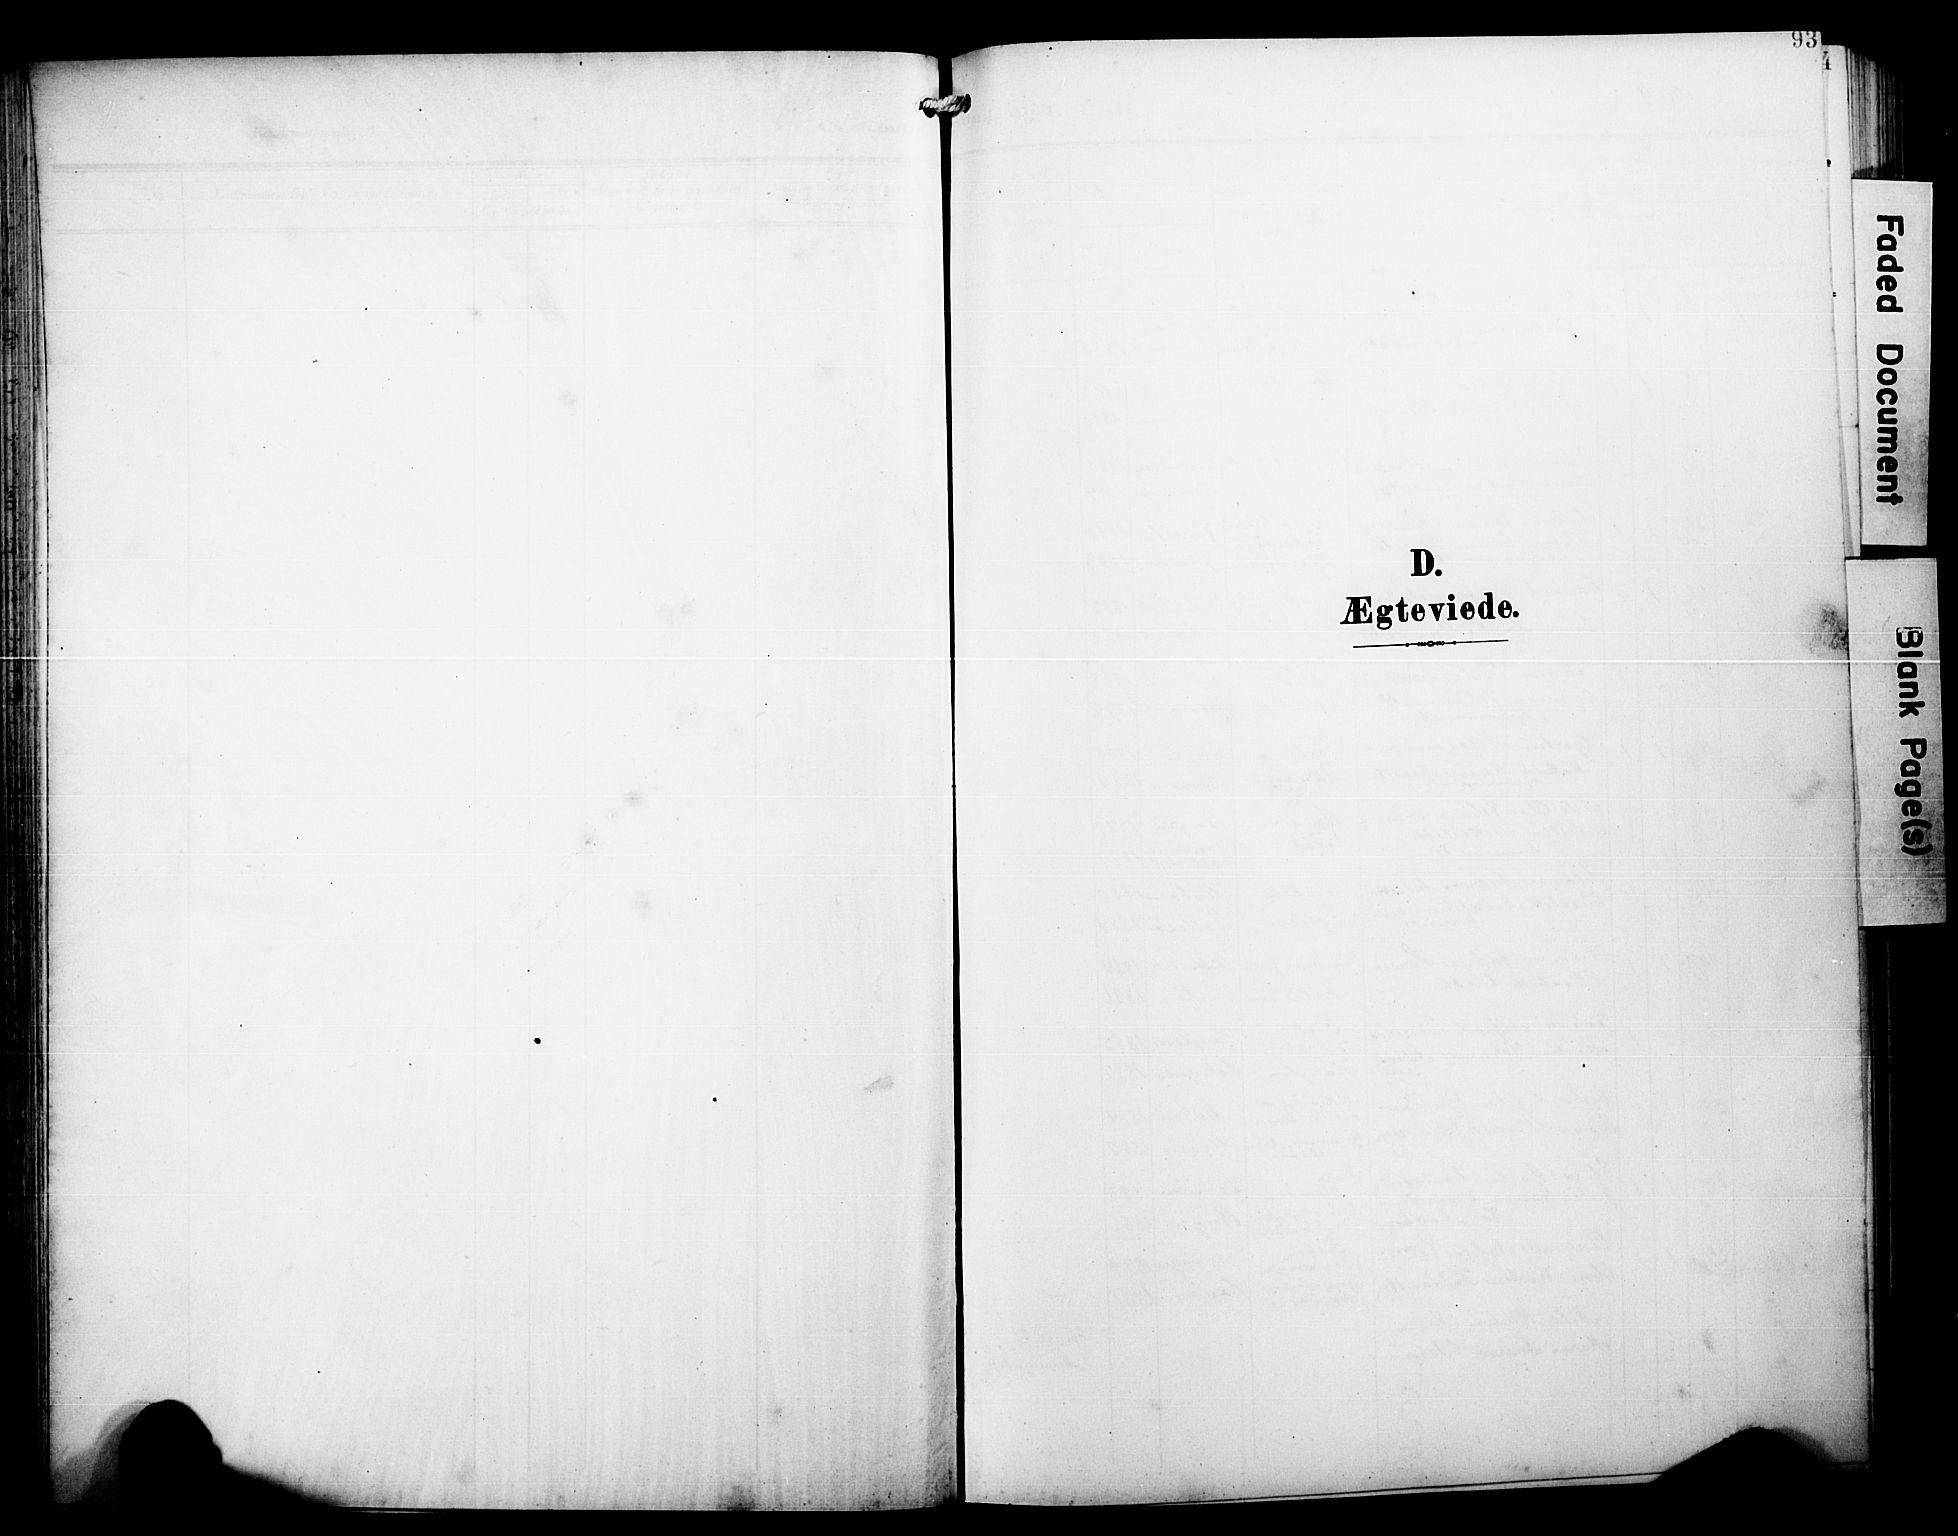 SAB, Askøy Sokneprestembete, H/Ha/Hab/Haba/L0014: Klokkerbok nr. A 14, 1904-1927, s. 93